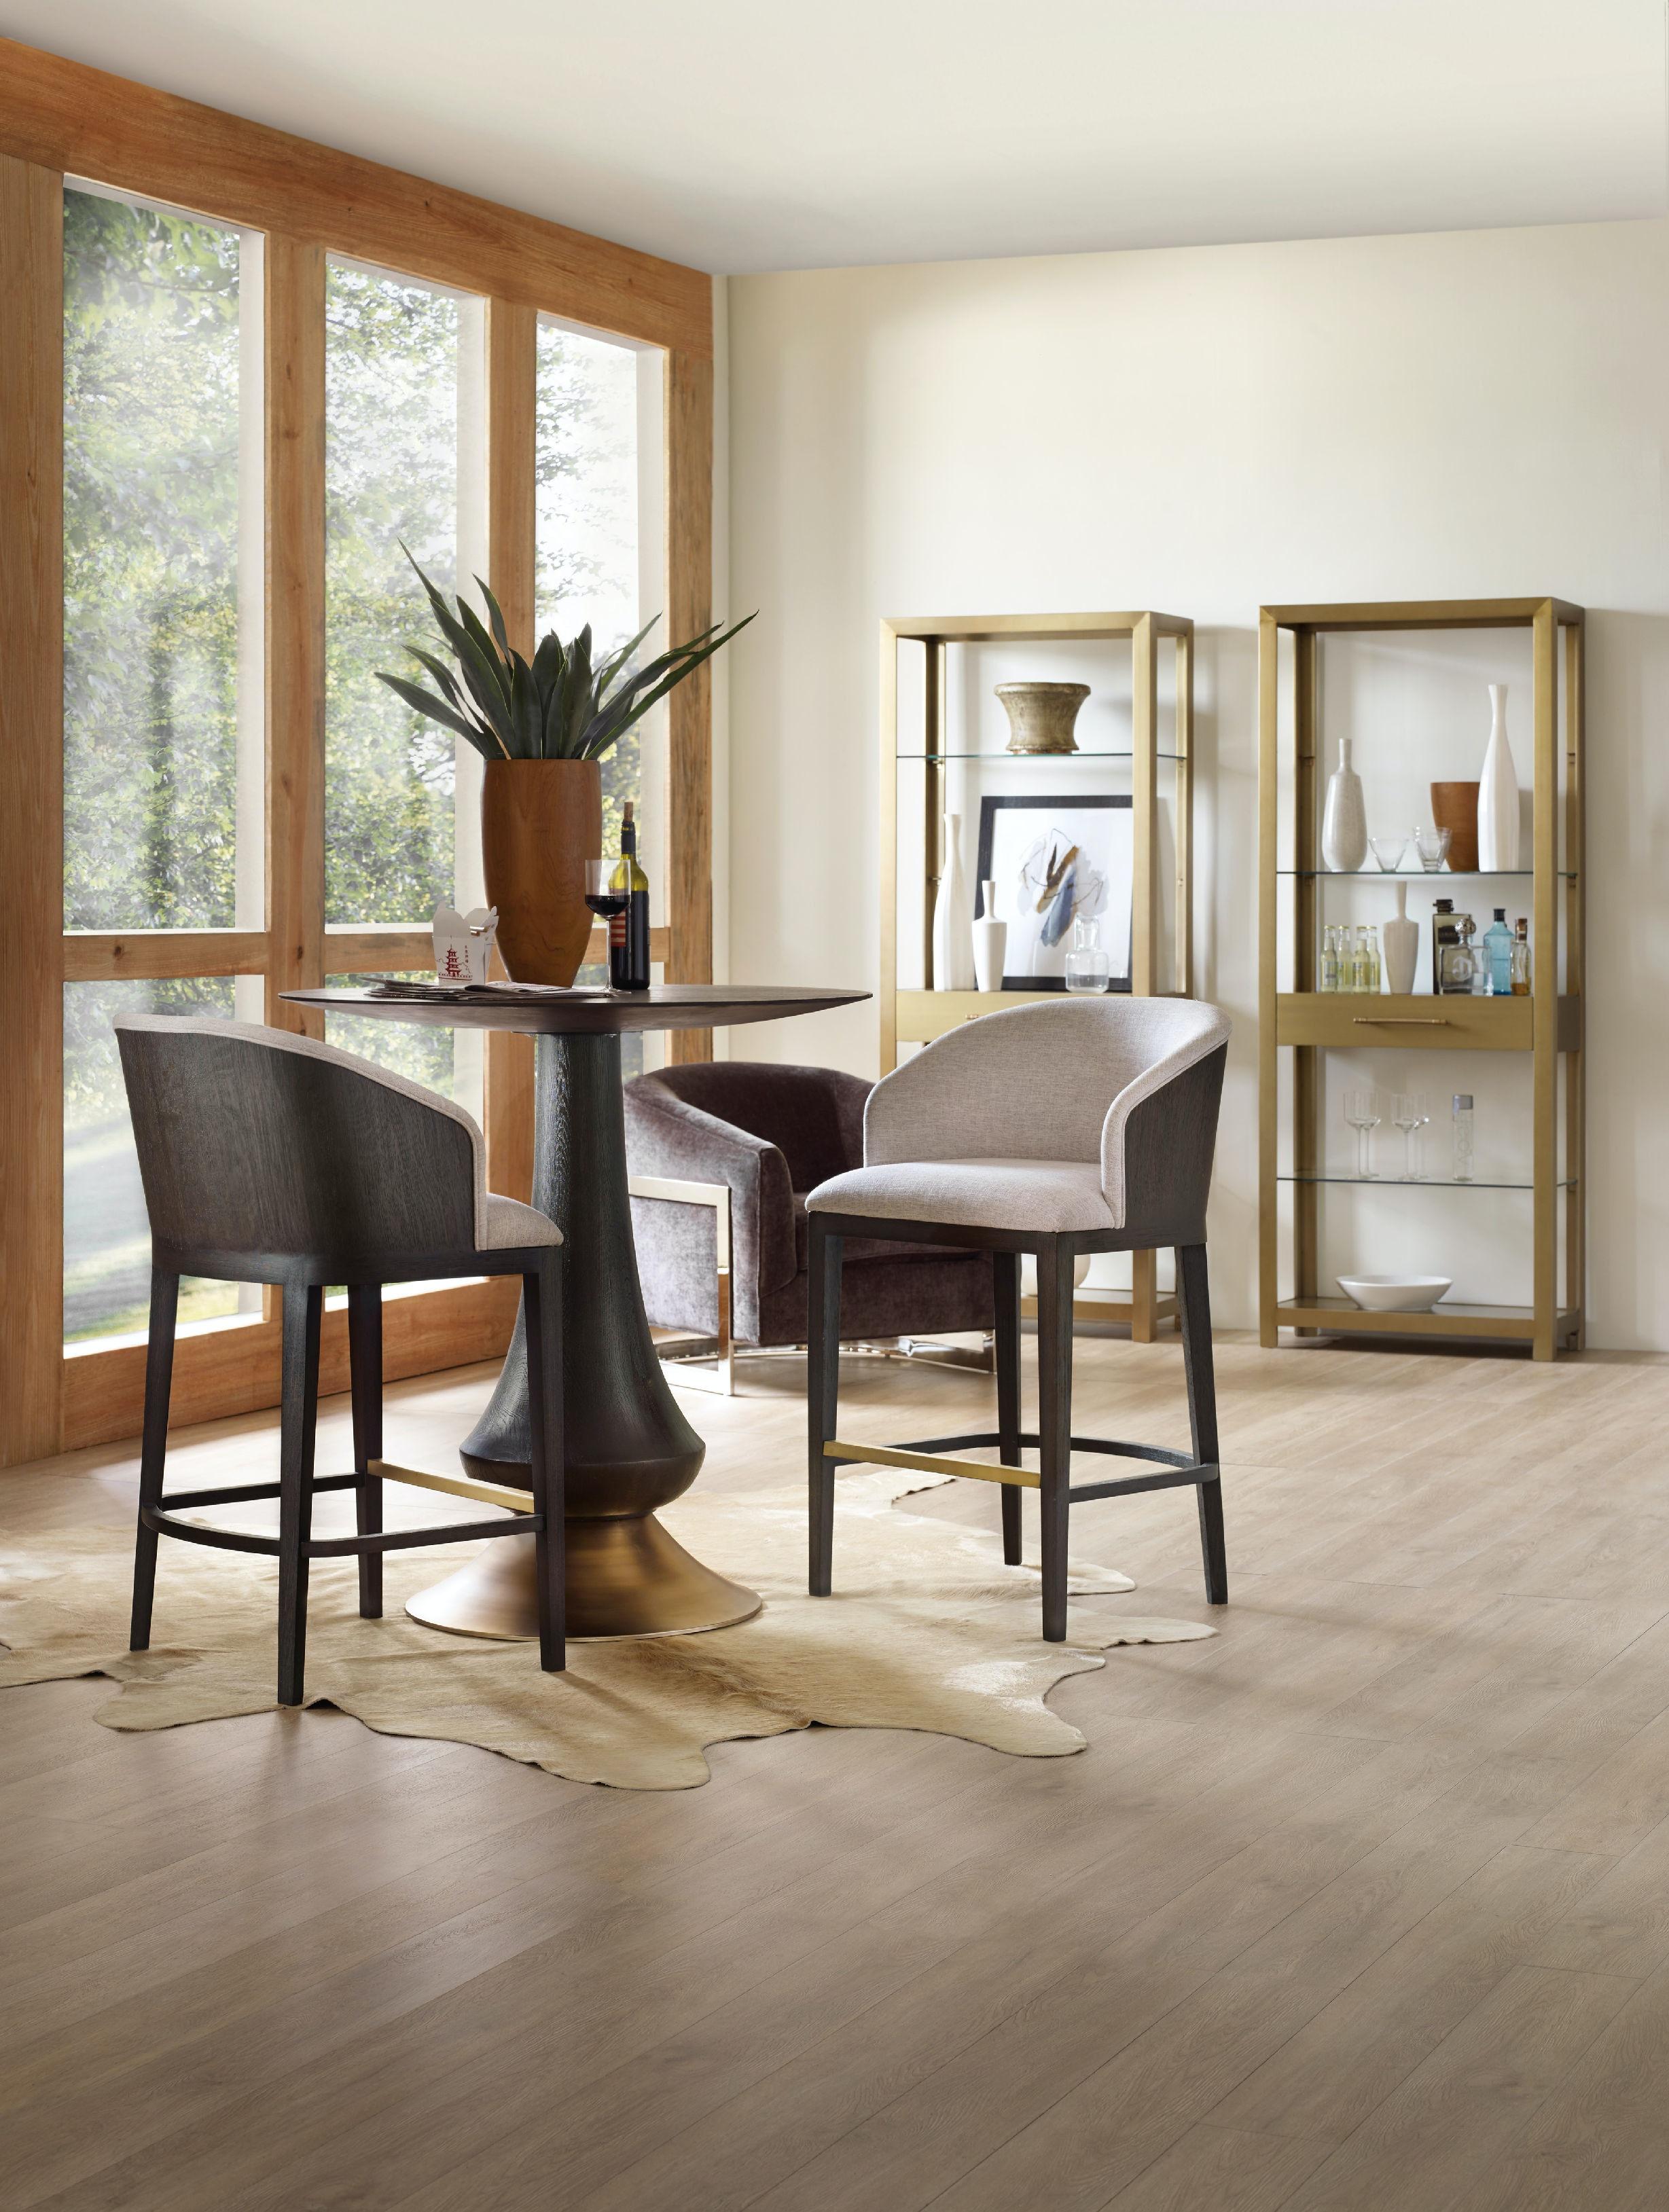 Hooker Furniture Dining Room Curata Pub Table 1600 75202 Dkw Tin Roof  Spokane Wa Hooker Dining Room